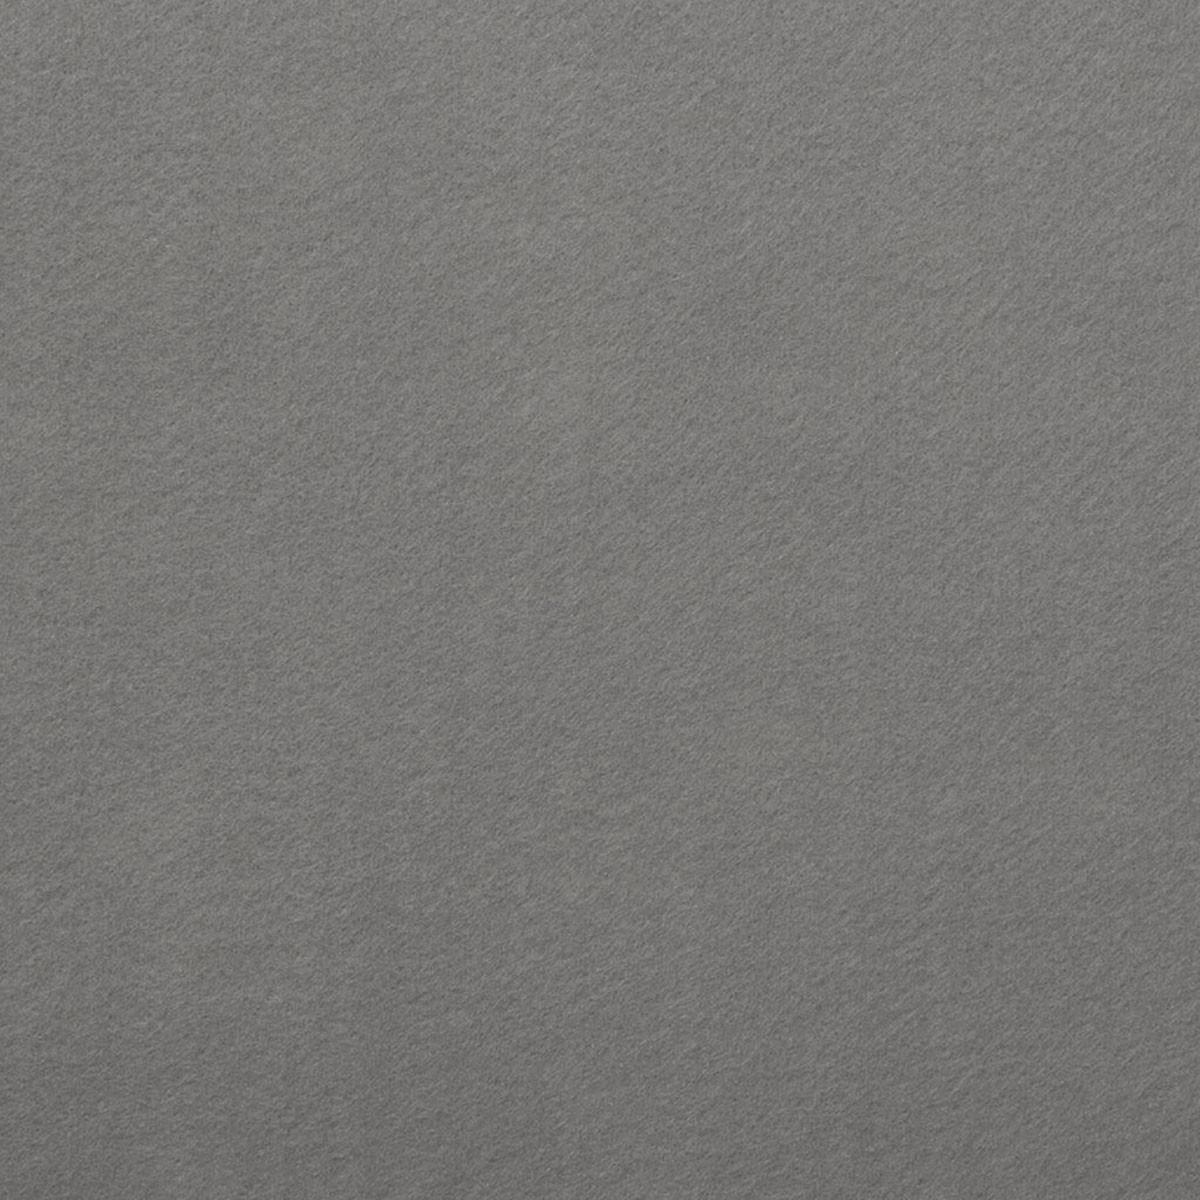 Feutrine grise 91cm